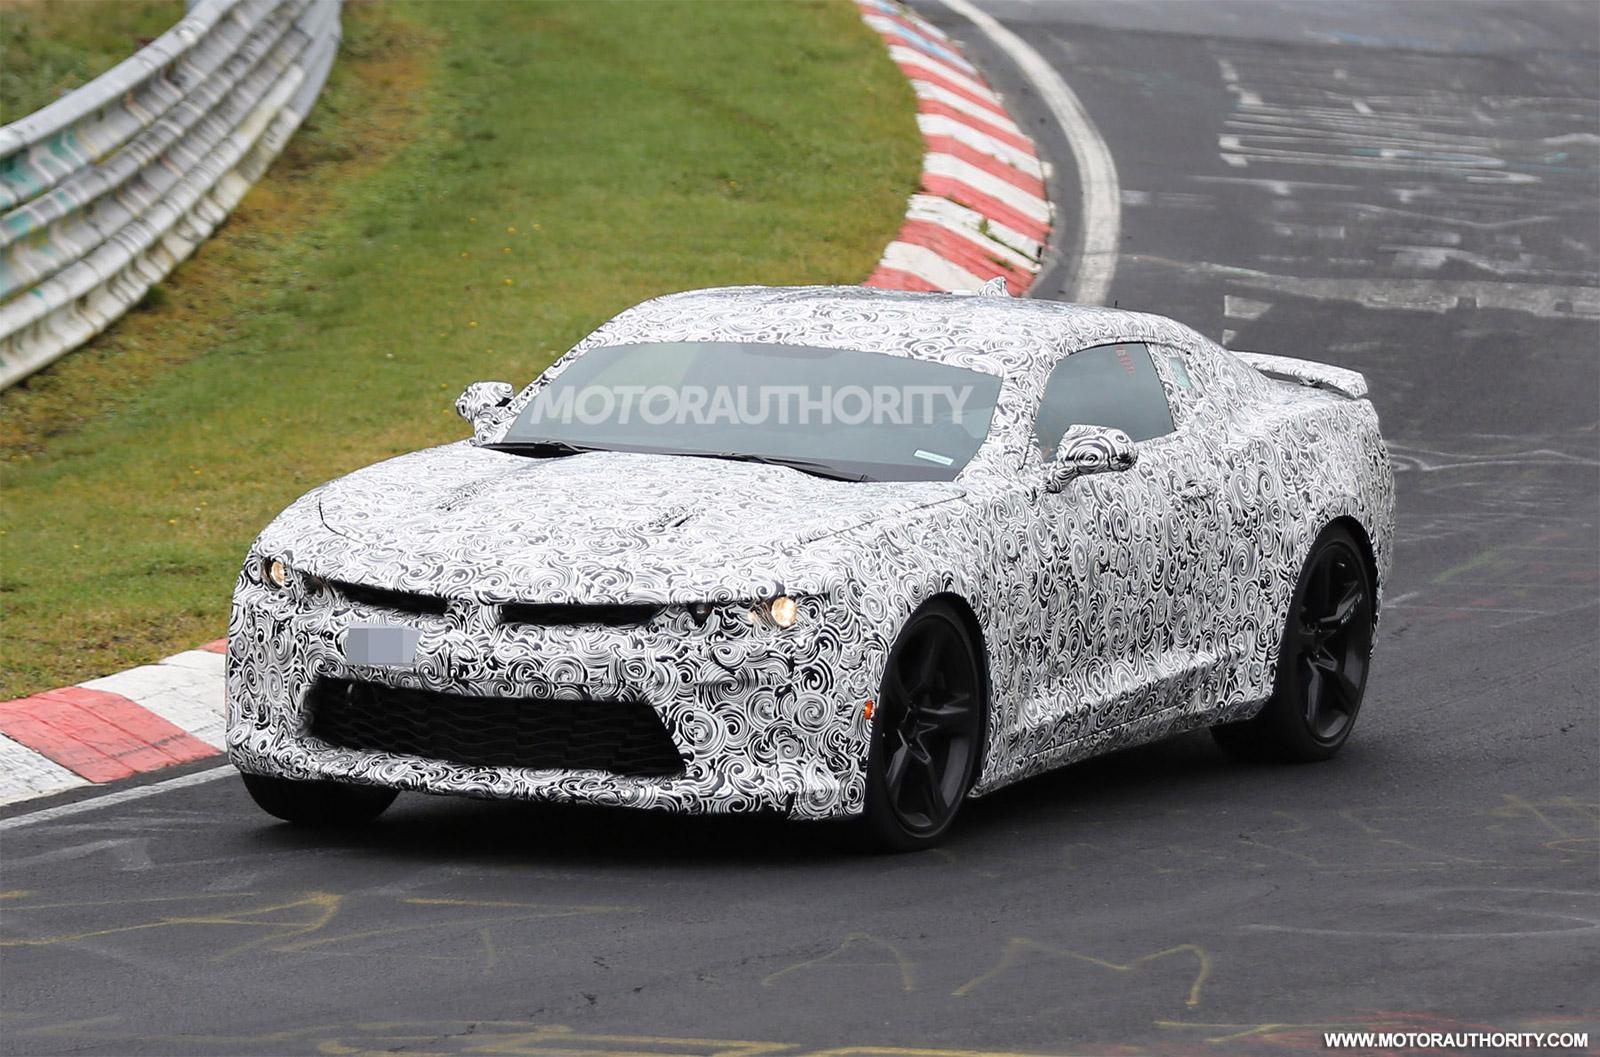 2016 Chevy Camaro Headlights Being Sold On eBay?